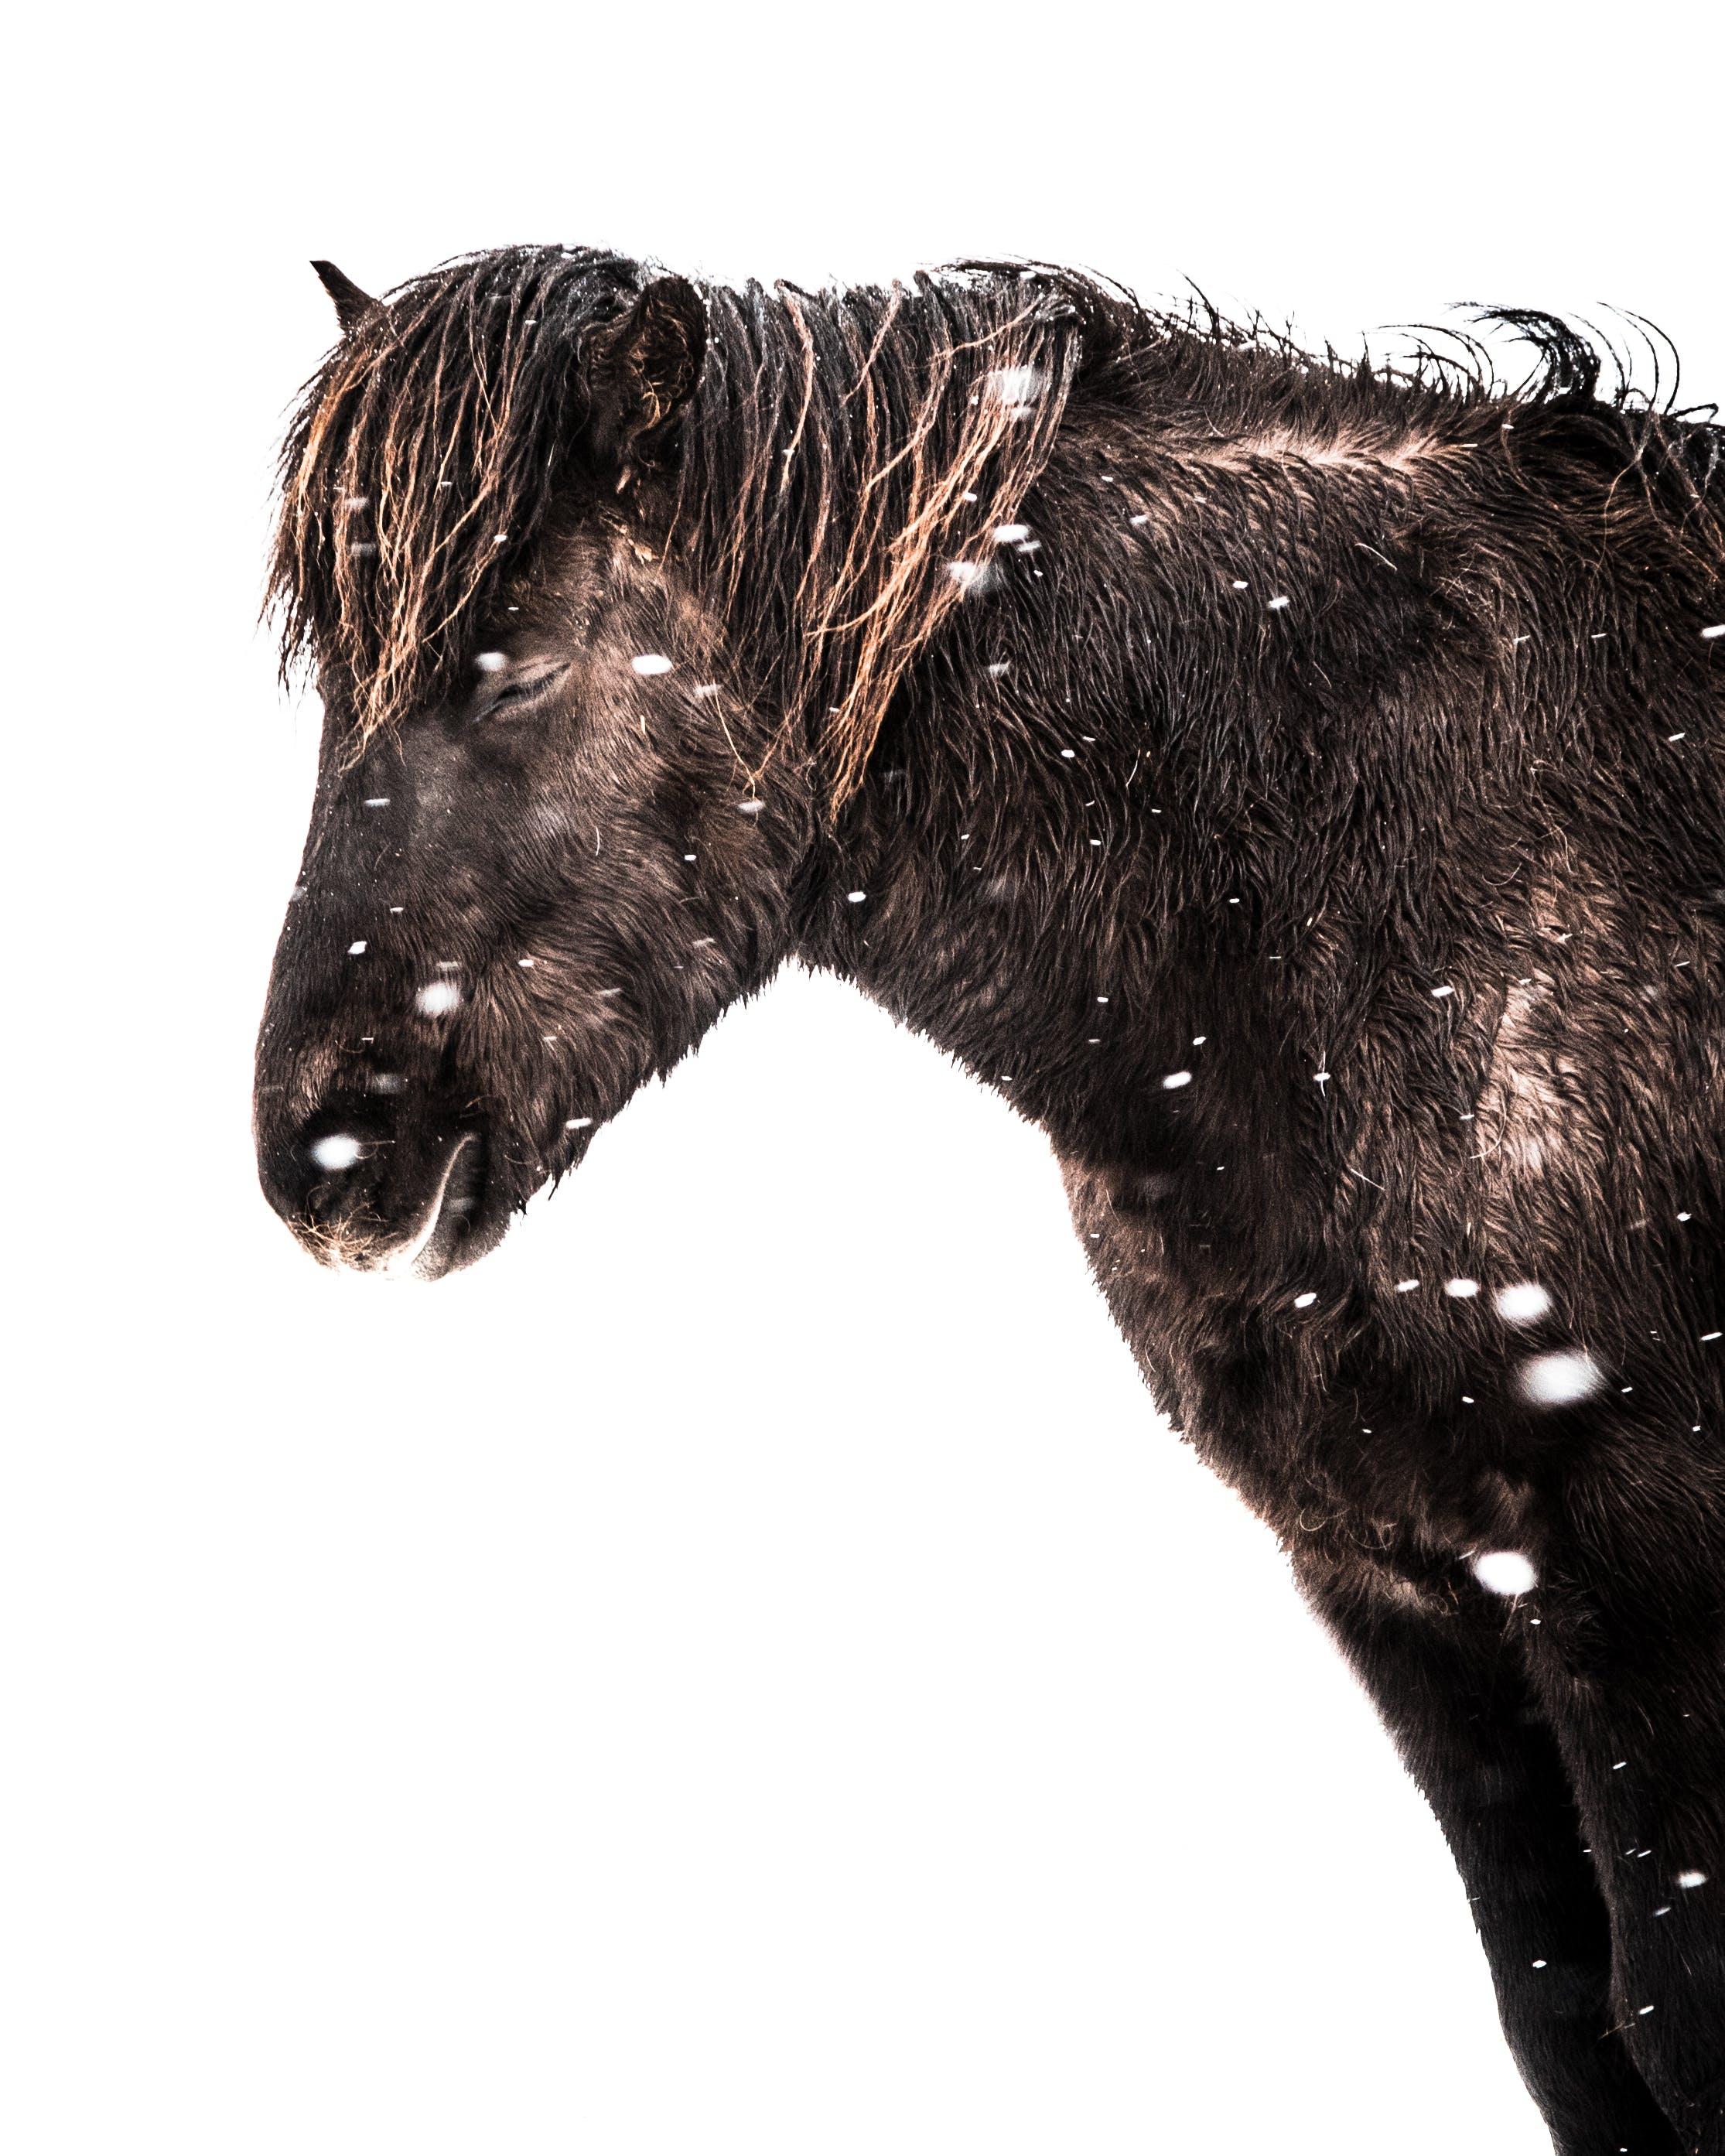 Photo Of Black Horse